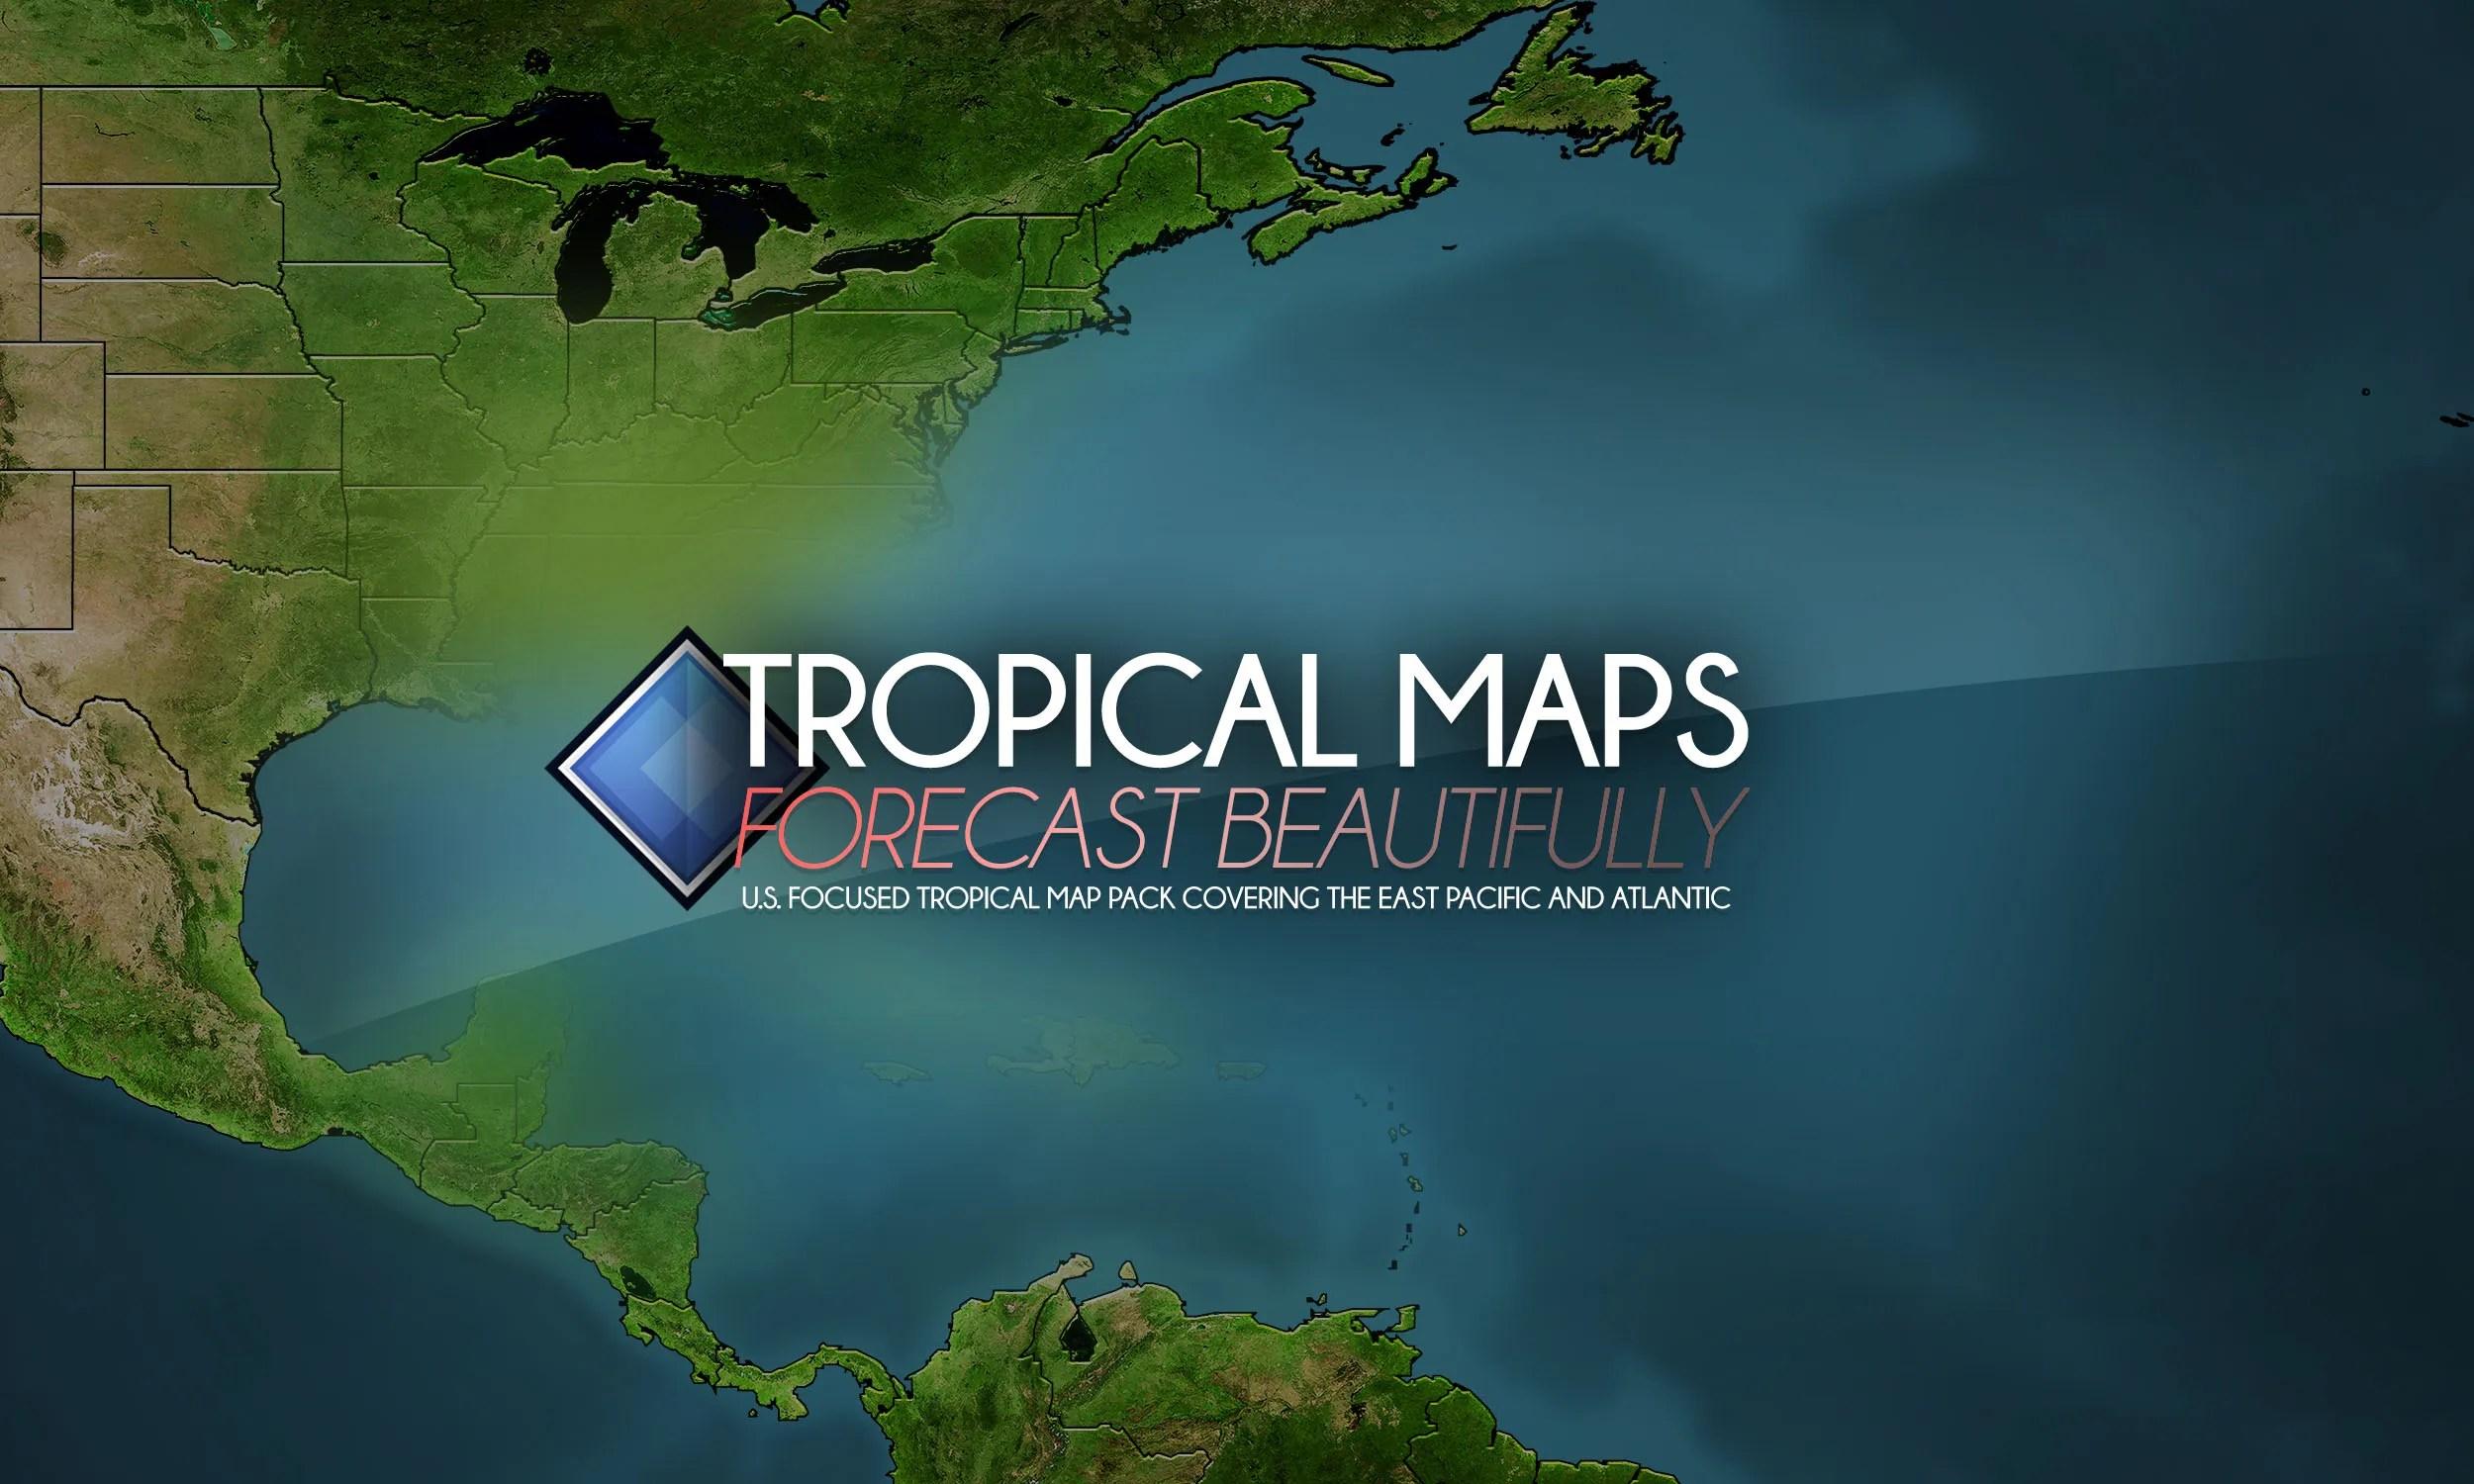 Tropical Maps